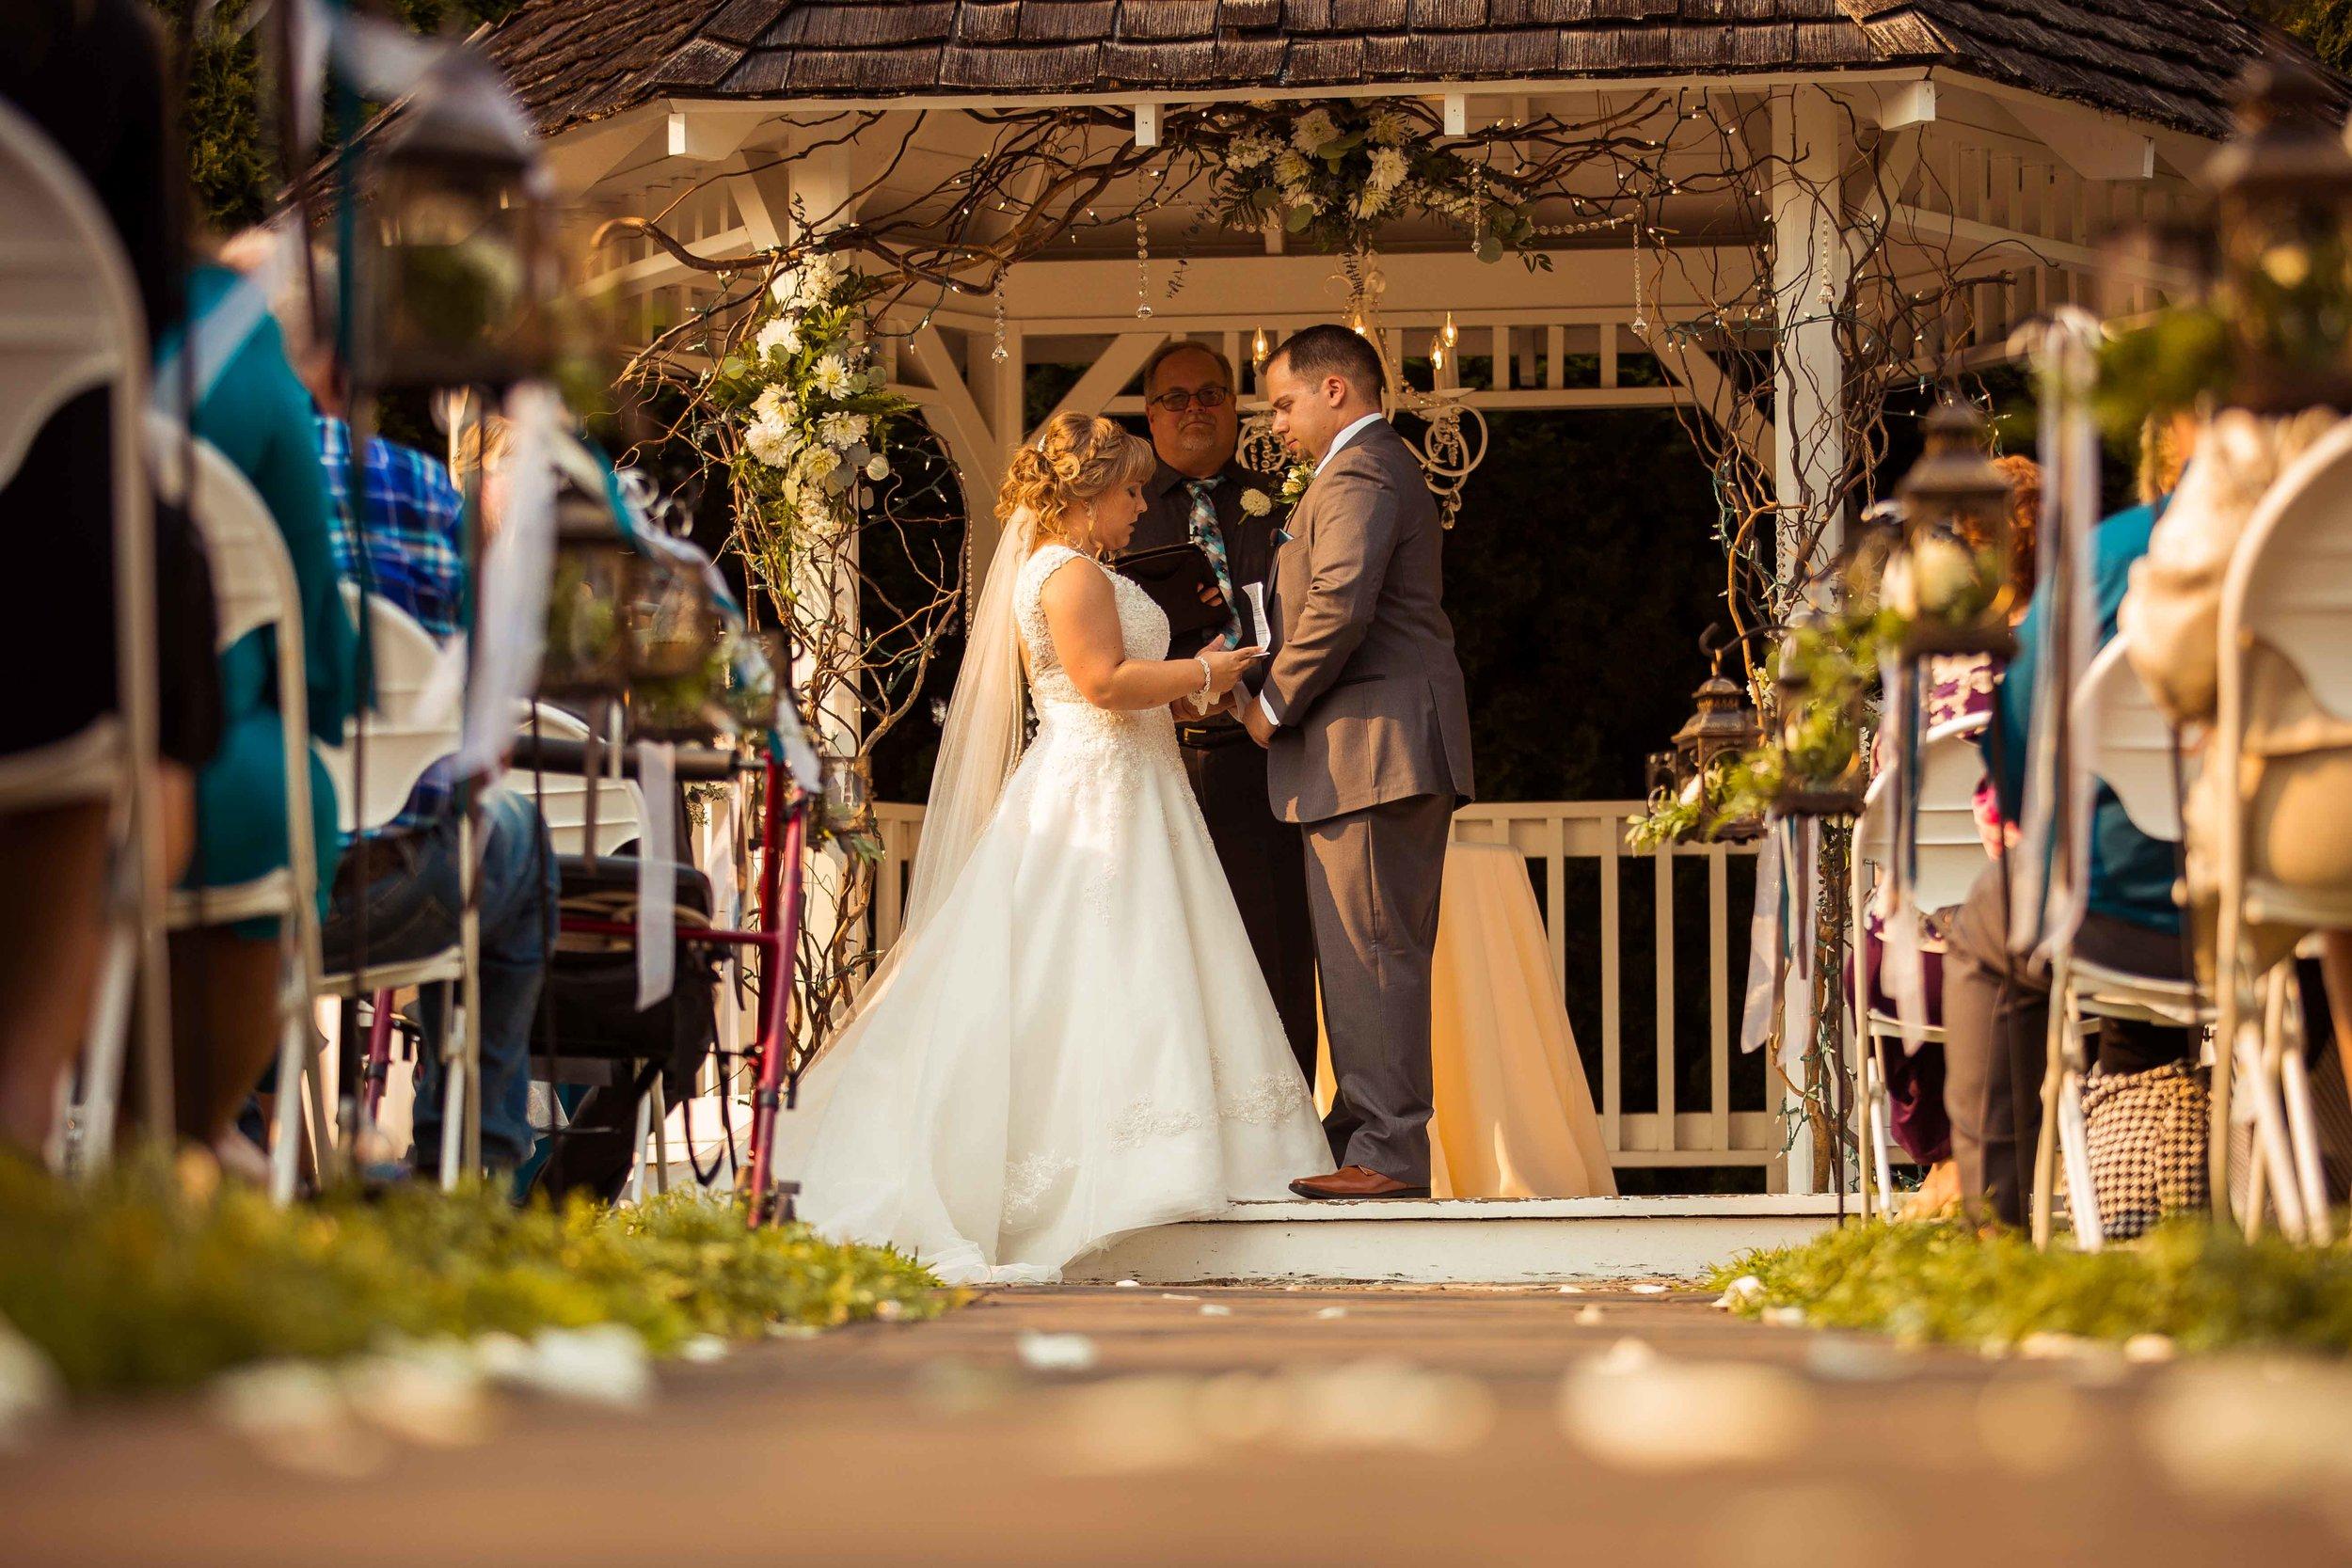 Ceremony Kaylee and Wyatt - Dillon Vibes Photography-2.jpg